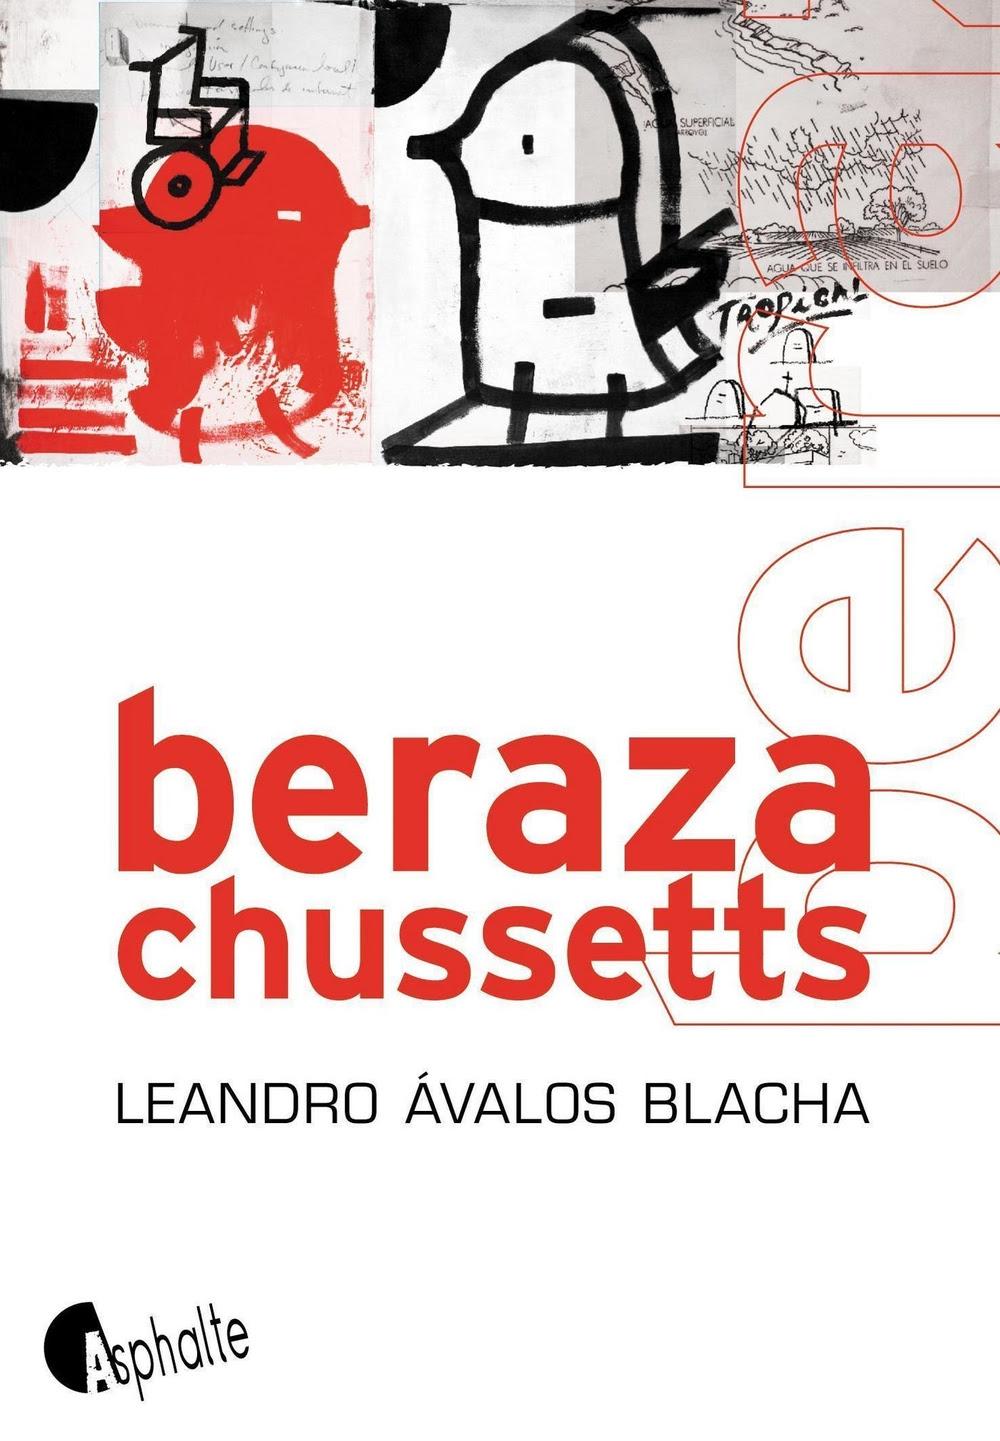 Berazachussetts de Leandro Avalos Blacha éditions asphalte